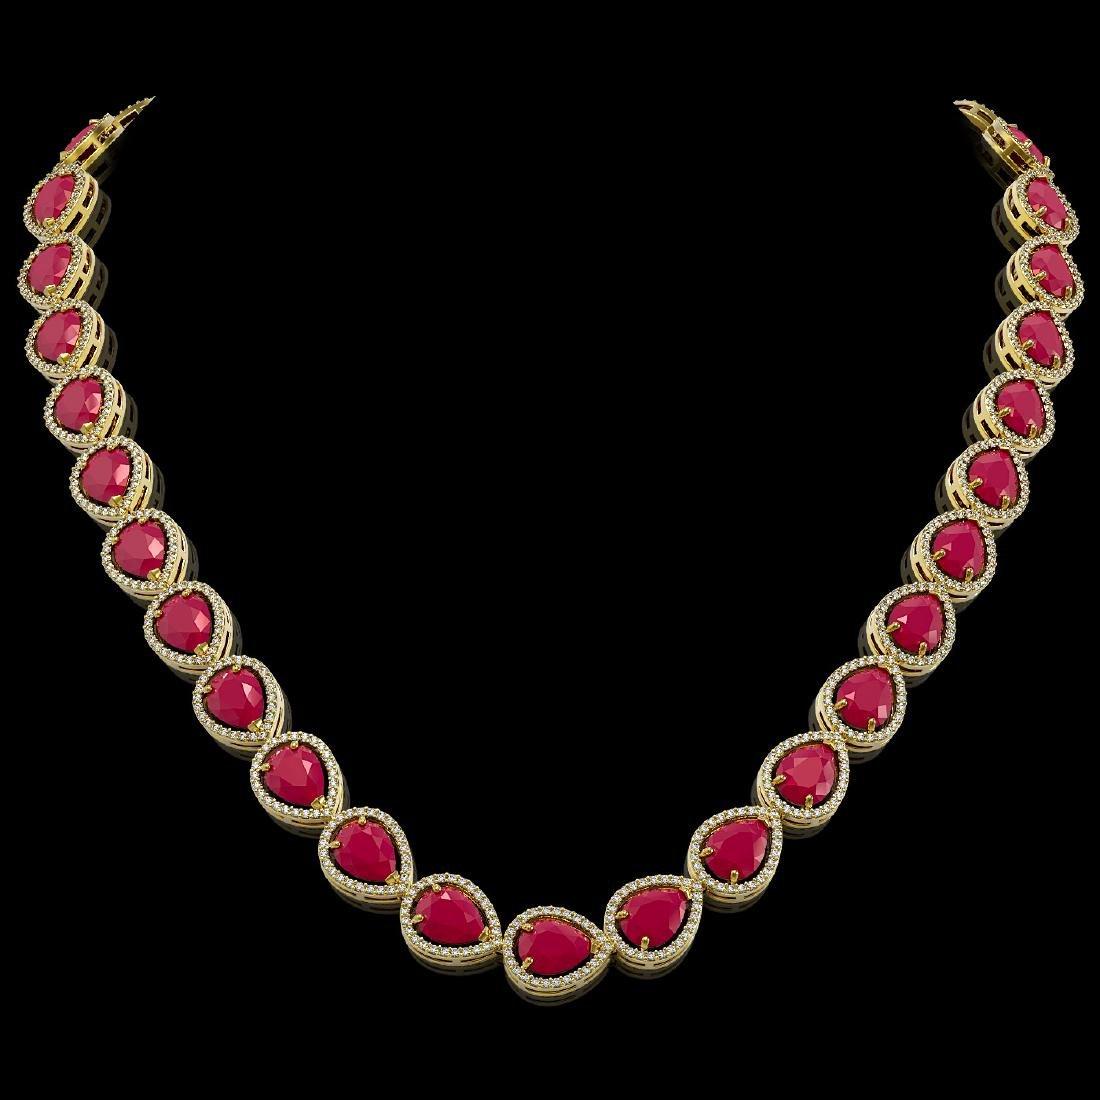 64.01 CTW Ruby & Diamond Halo Necklace 10K Yellow Gold